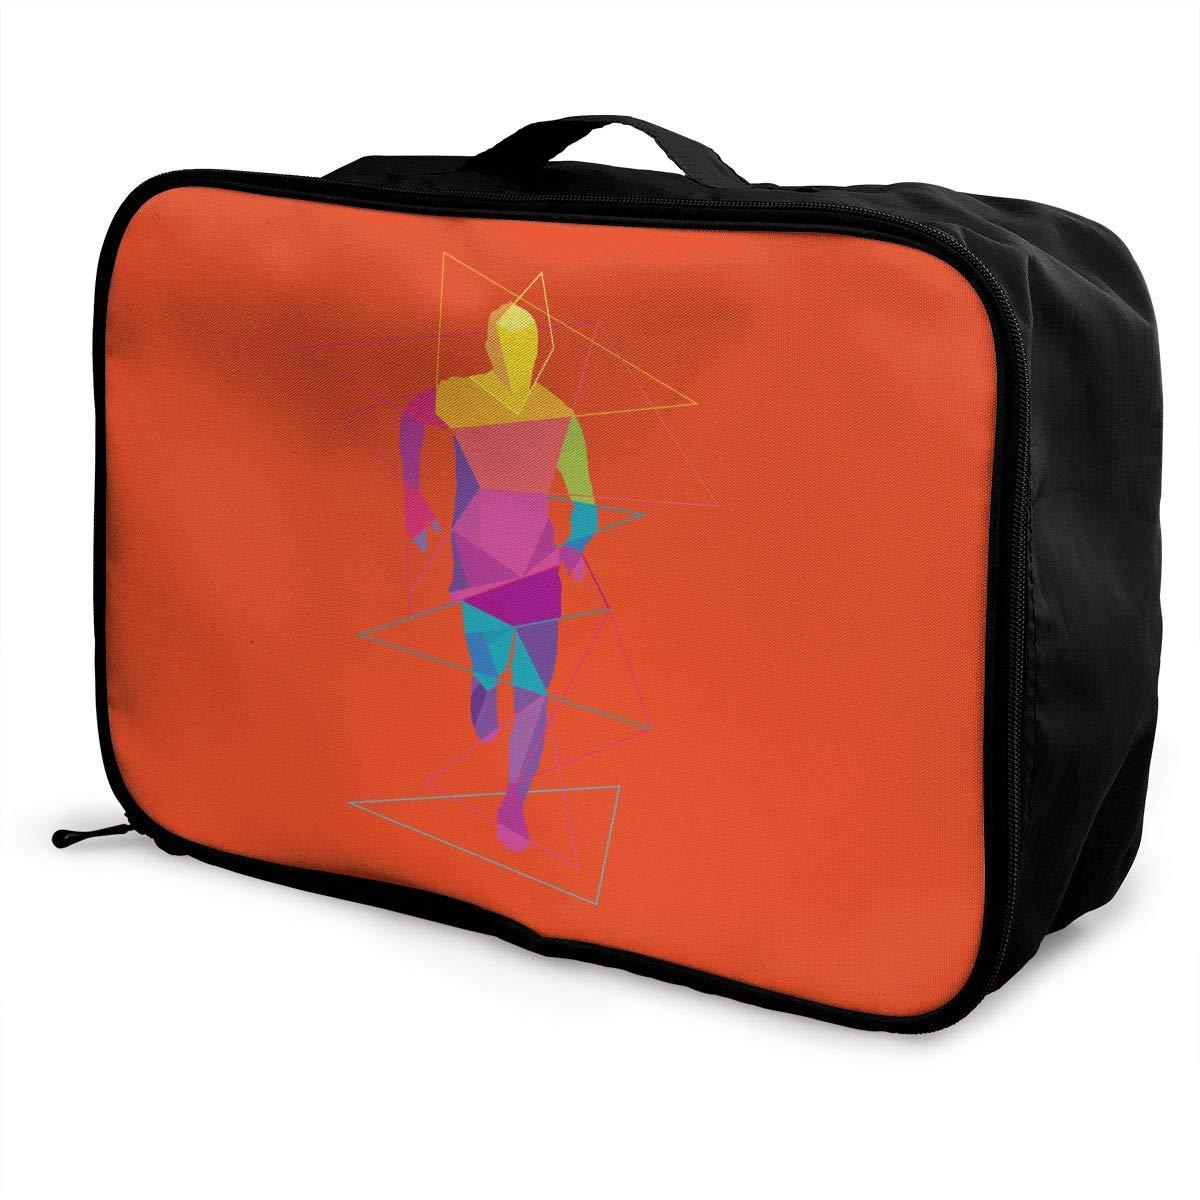 Travel Luggage Duffle Bag Lightweight Portable Handbag Run Large Capacity Waterproof Foldable Storage Tote